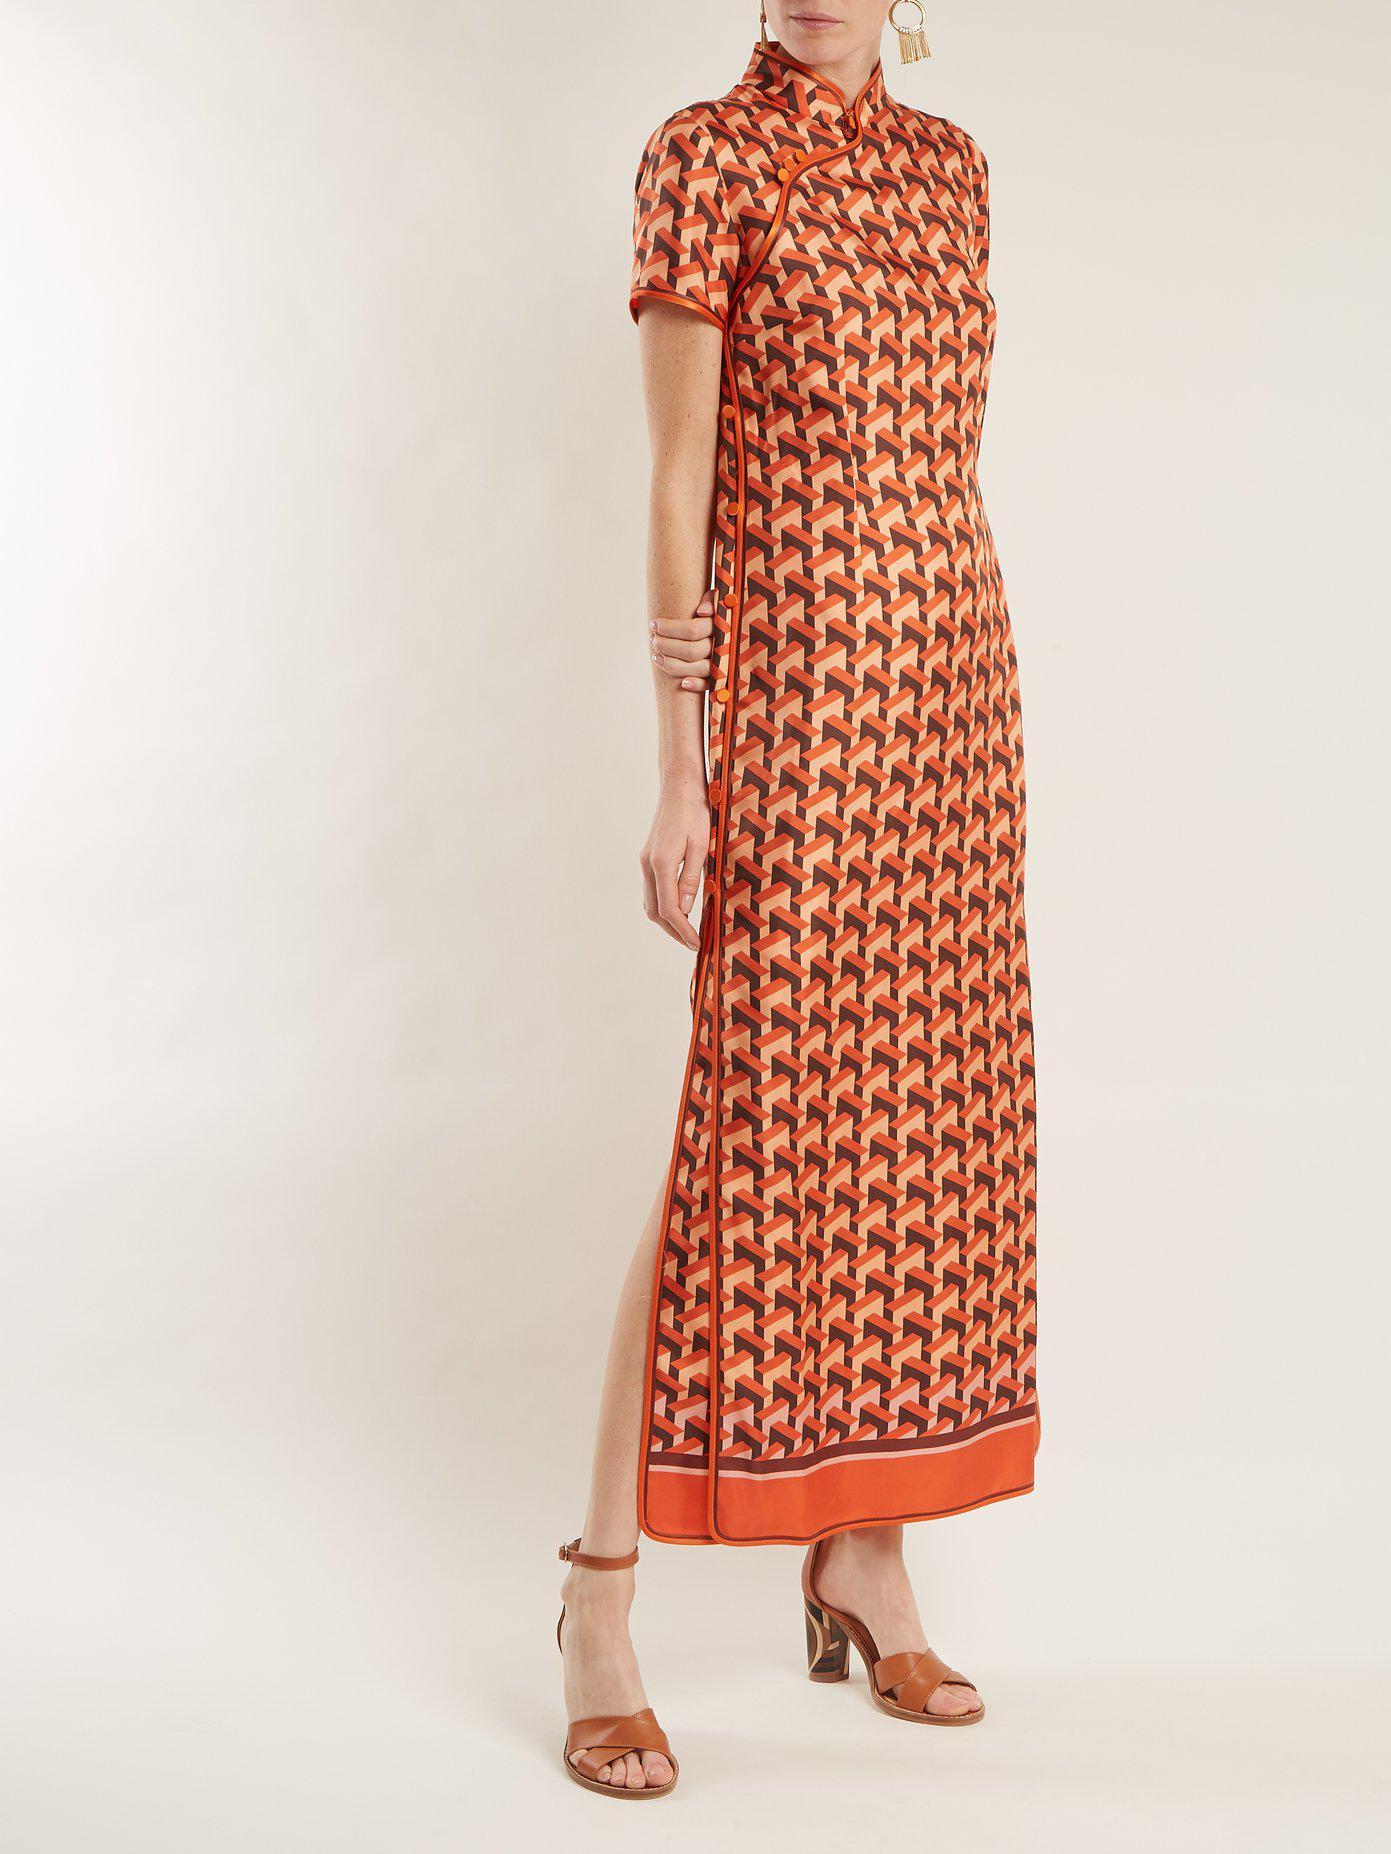 Eutenea Printed Silk-twill Midi Dress - Orange F.R.S. For Restless Sleepers i3WNh